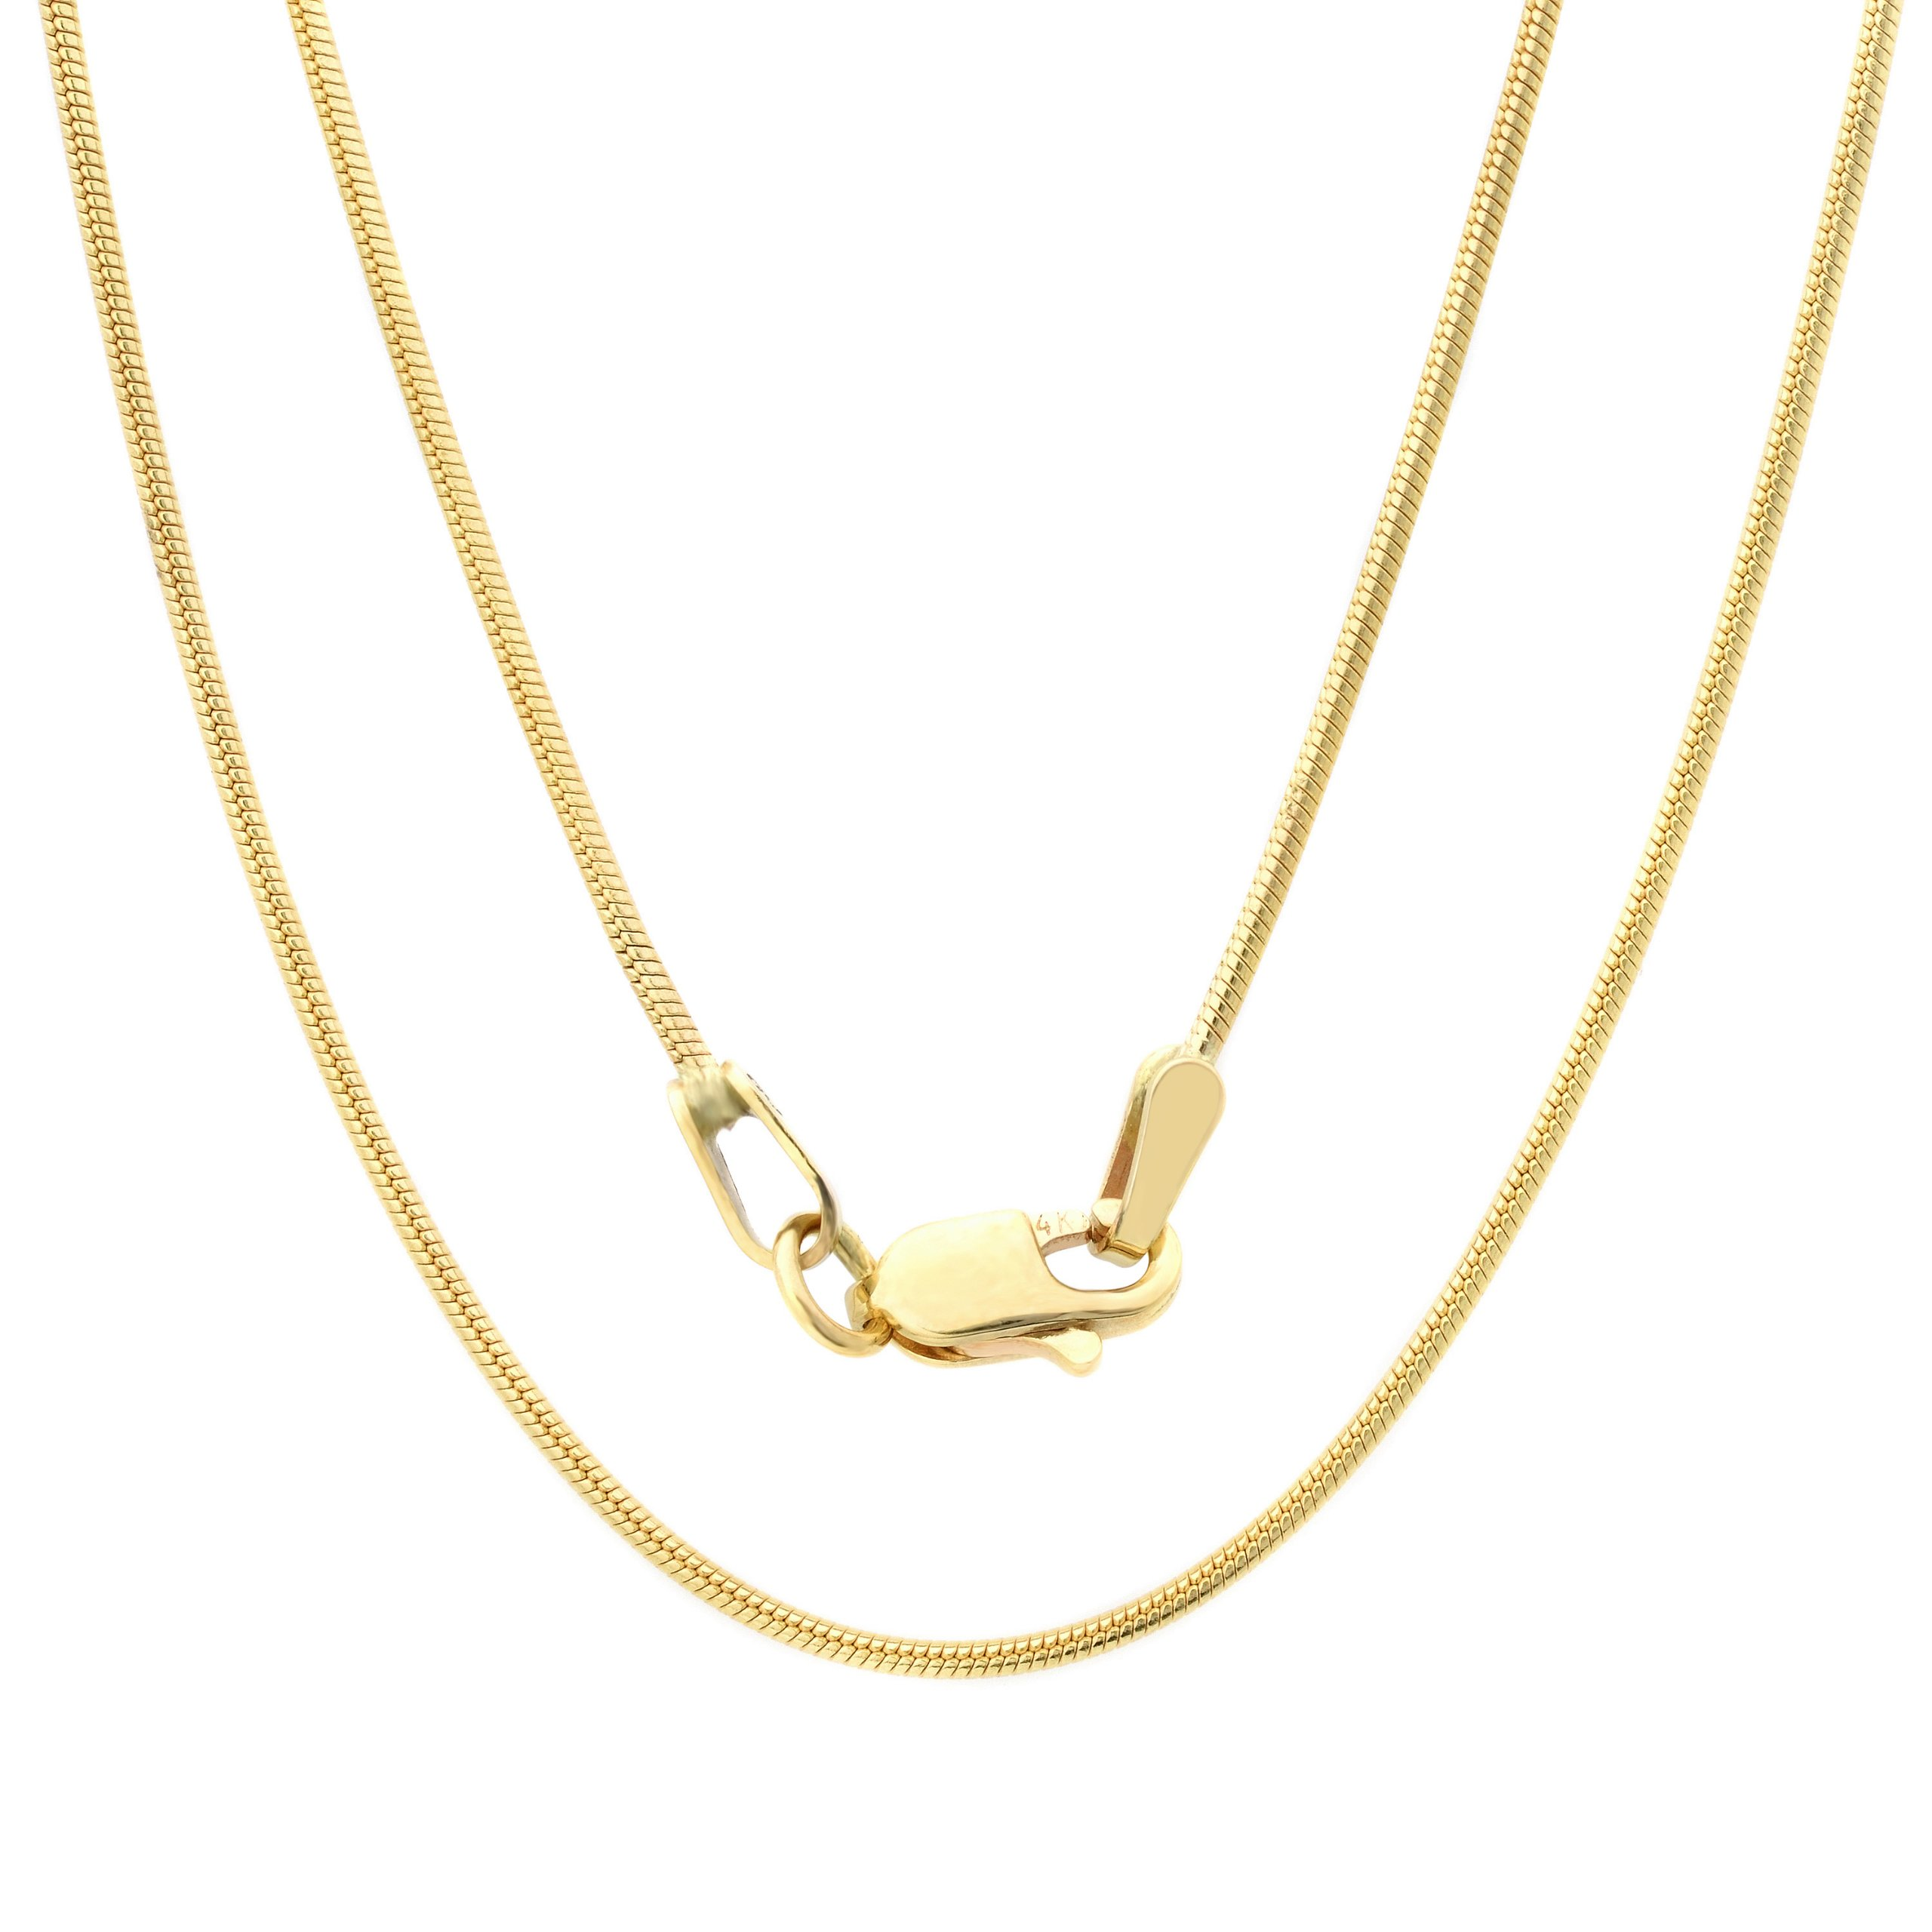 14k Yellow-gold .80 mm Snake Chain, 20 Inch by Roberto Martinez